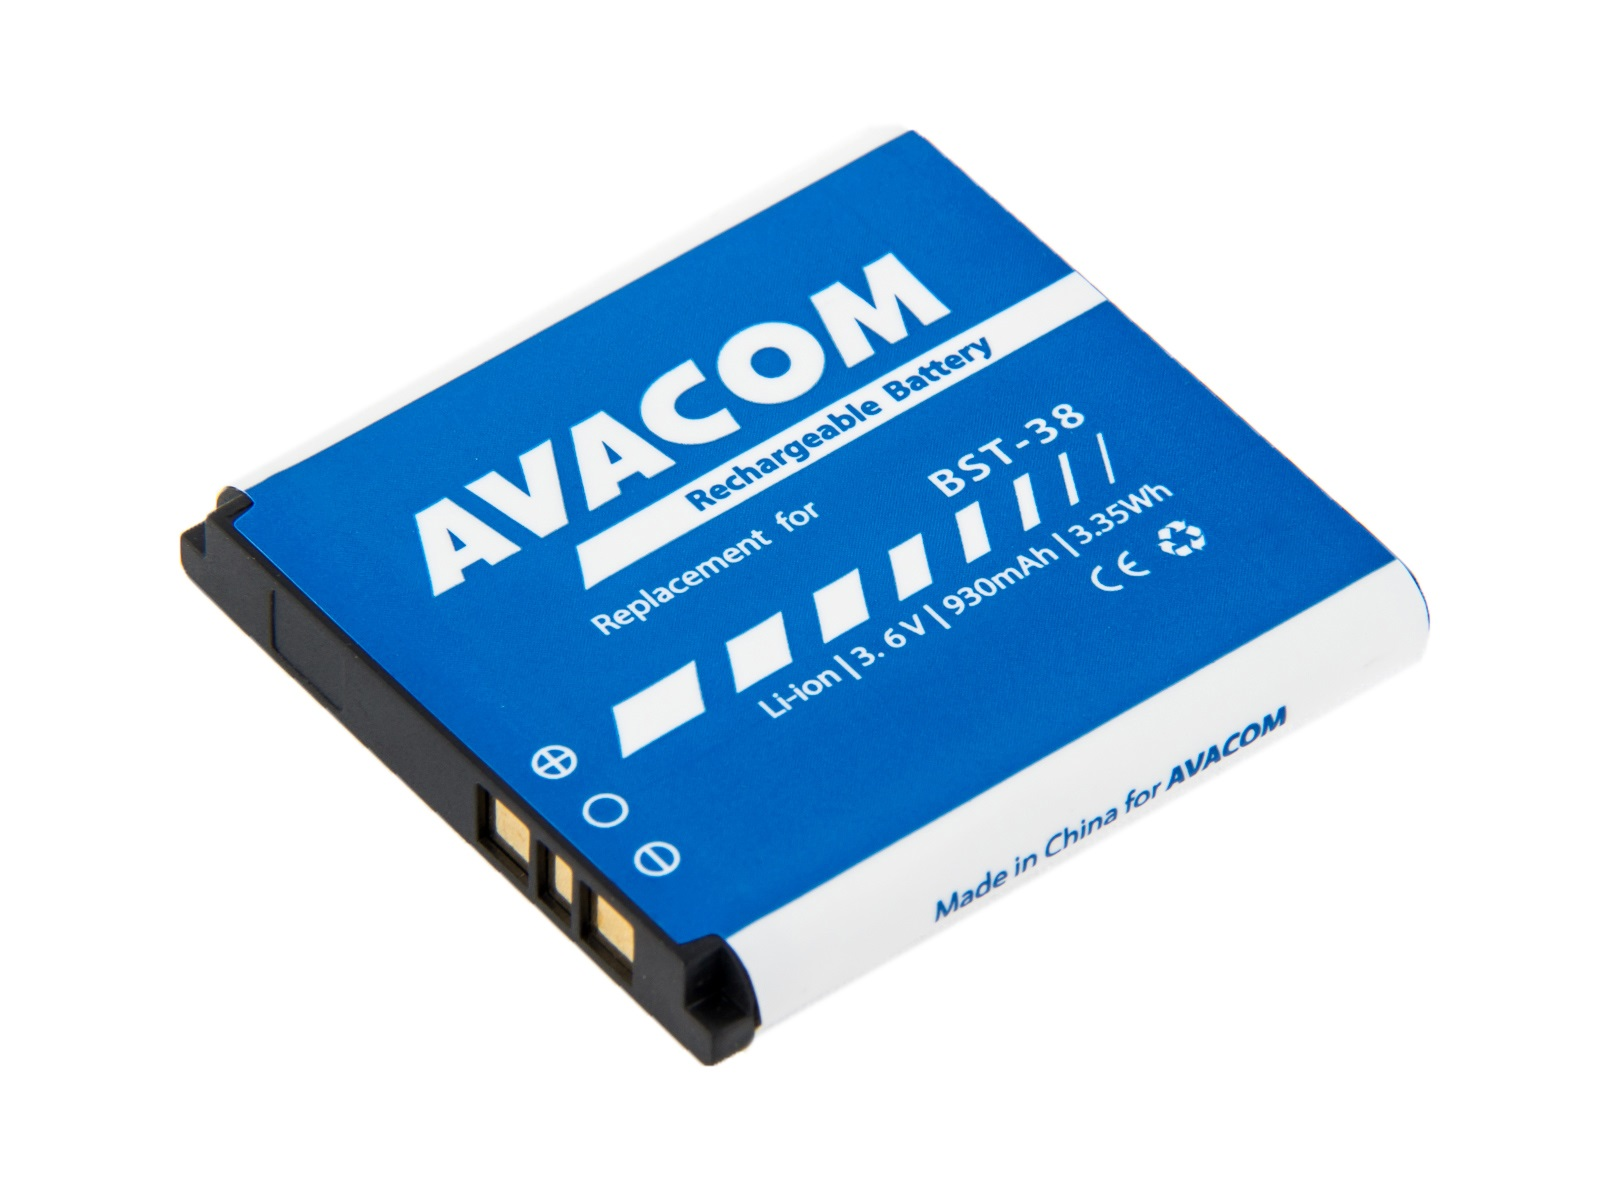 Baterie AVACOM do mobilu Sony Ericsson S510i, K770  Li-Ion 3,6V 930mAh (náhrada BST-38) - GSSE-BST38-S930